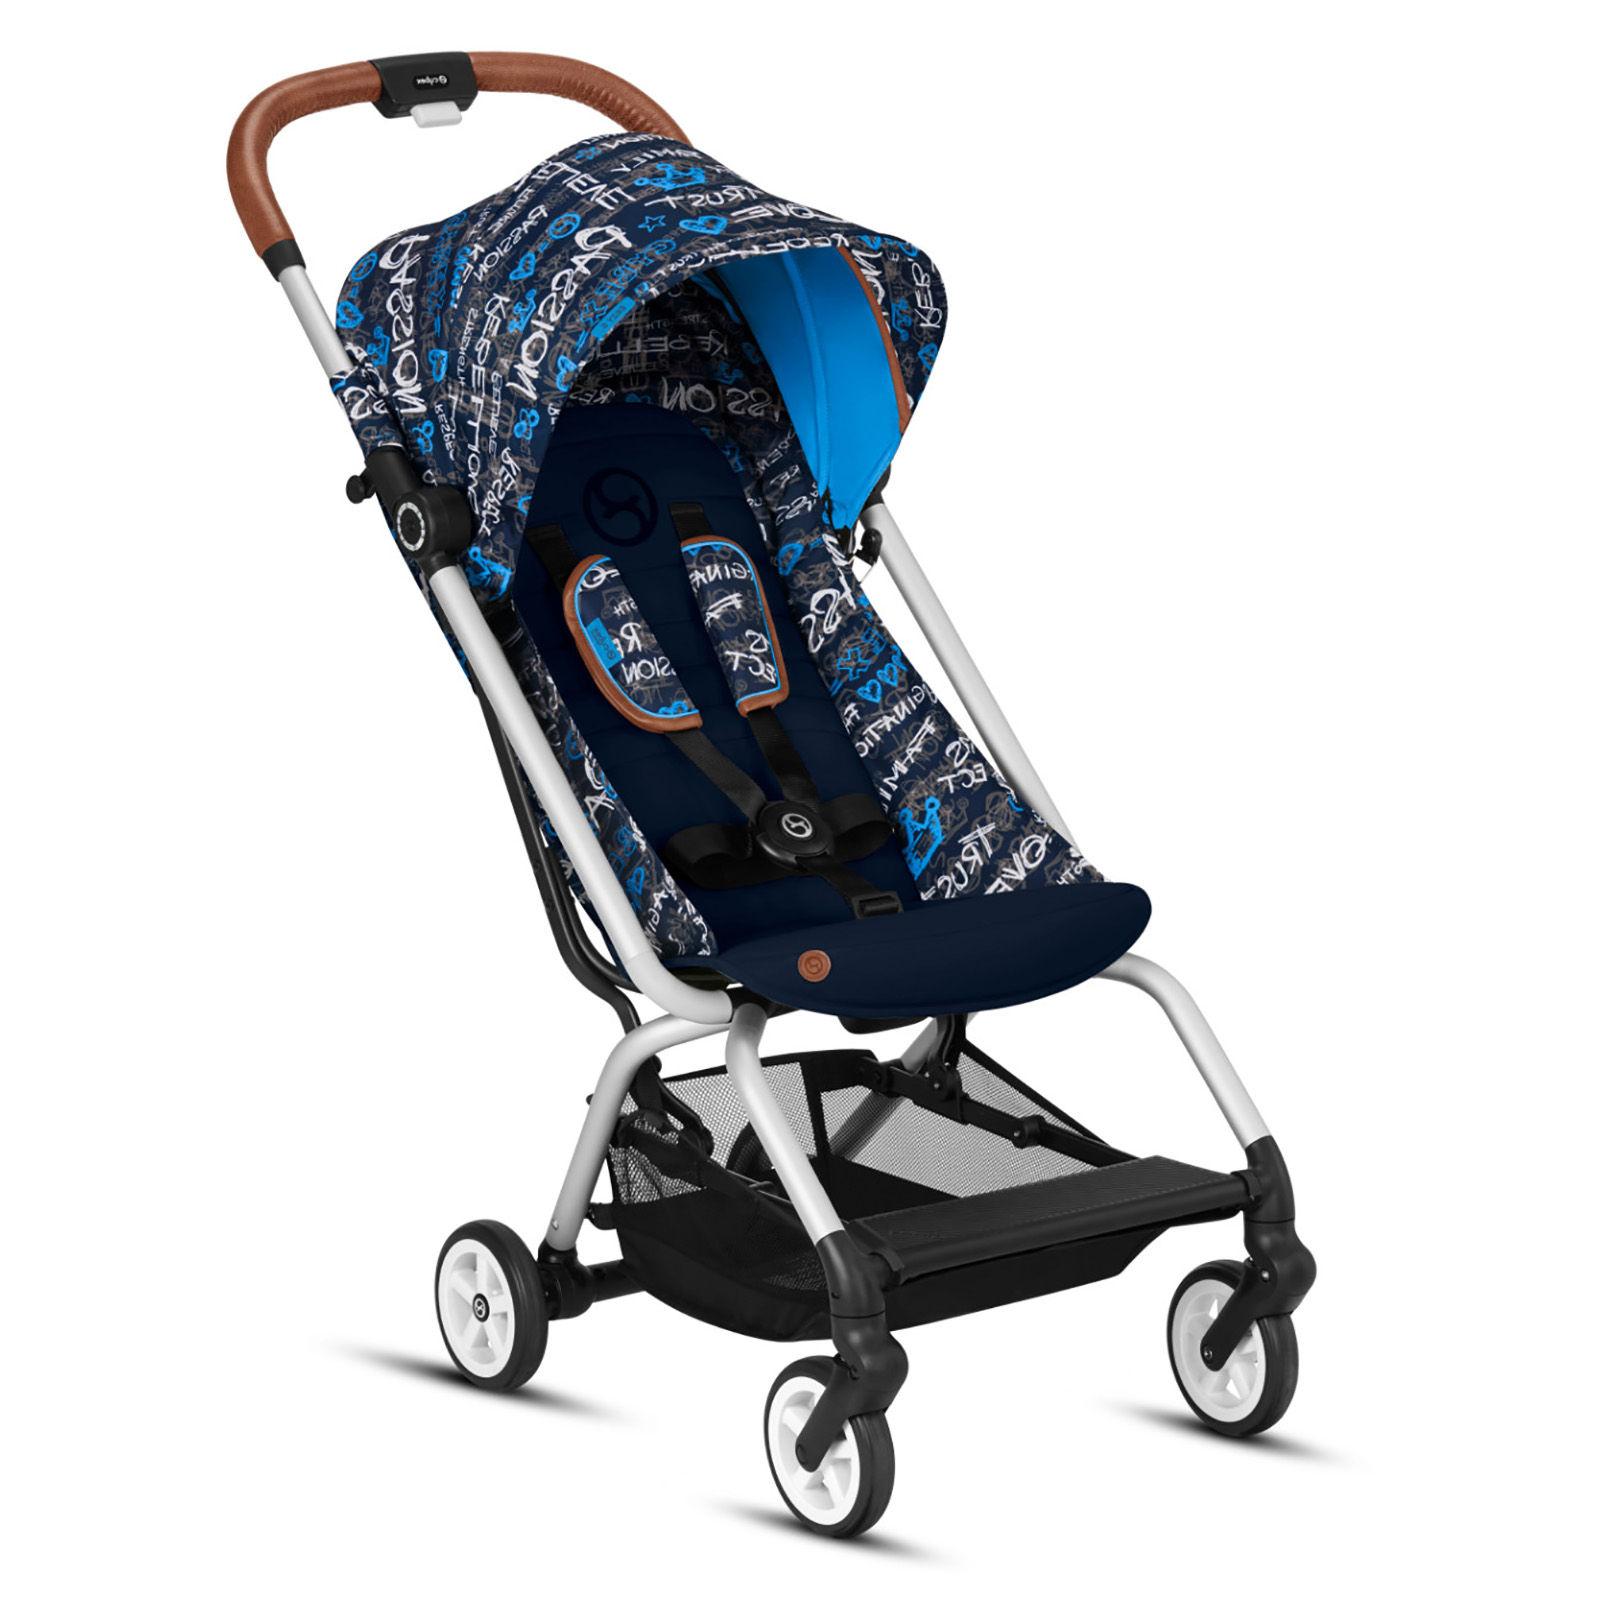 Cybex eezy S stroller £69.95 + 5% cashback through Quidco @ Online4baby